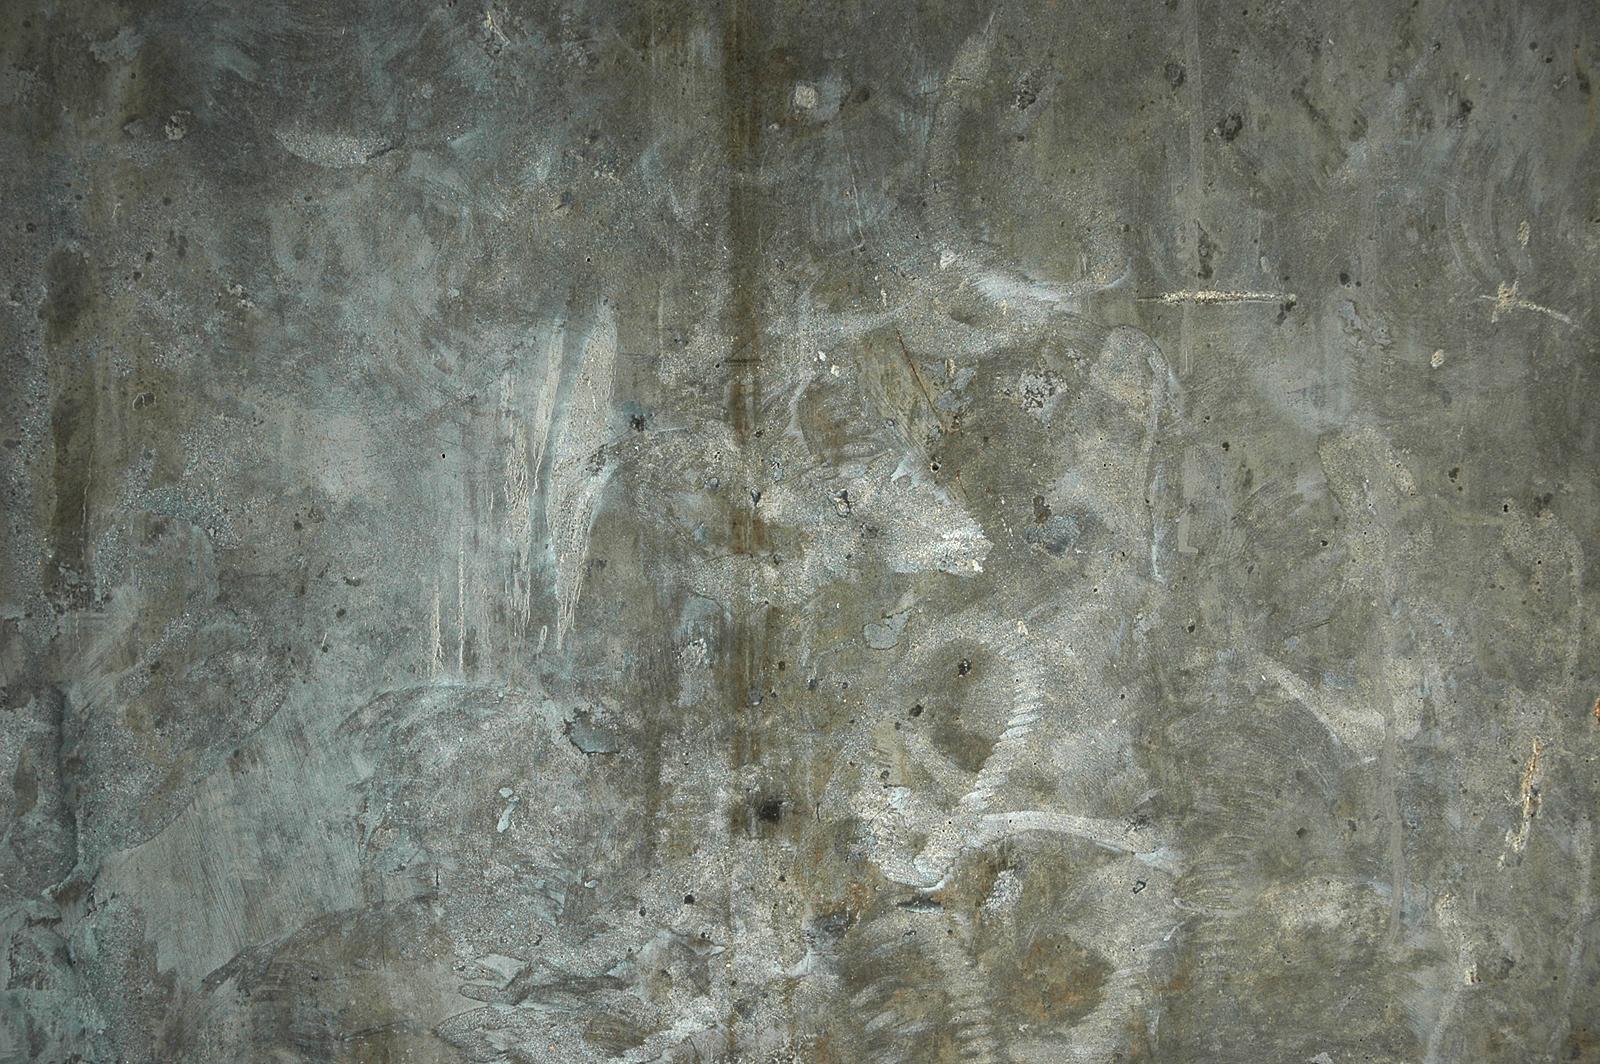 Concrete Floor Texture Concrete floor texture are